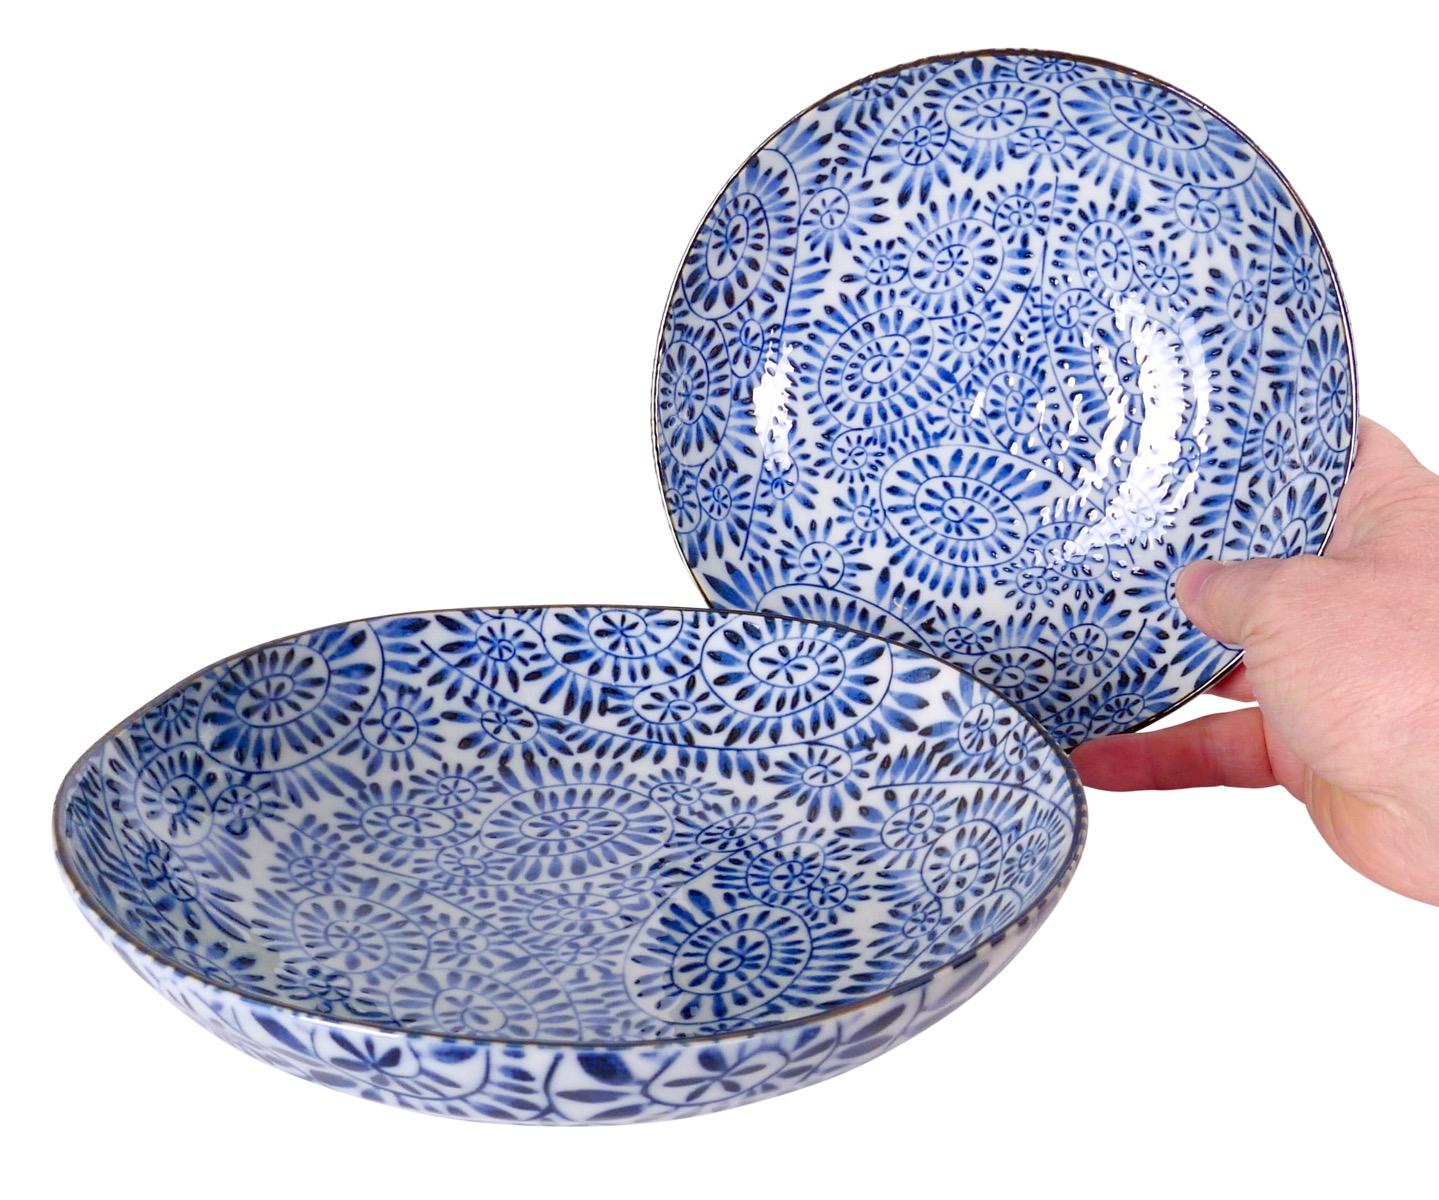 Image of Porcelain Shallow Serving or Pasta Bowl, Blue and White Karakusa 8.25